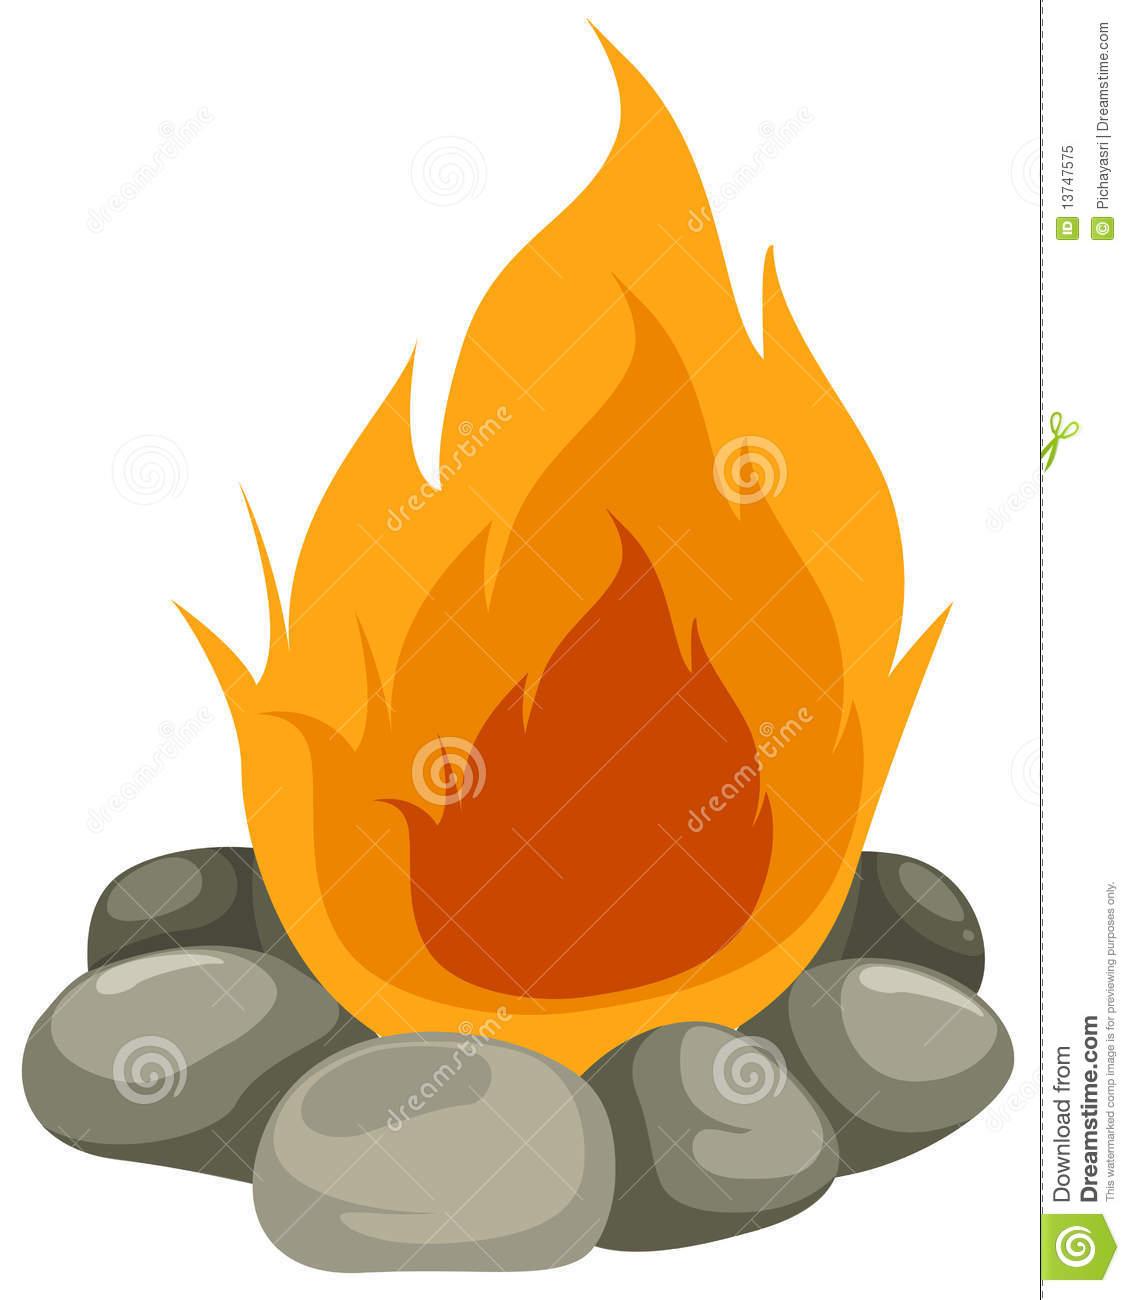 Campfire Clipart - Clipart Kid